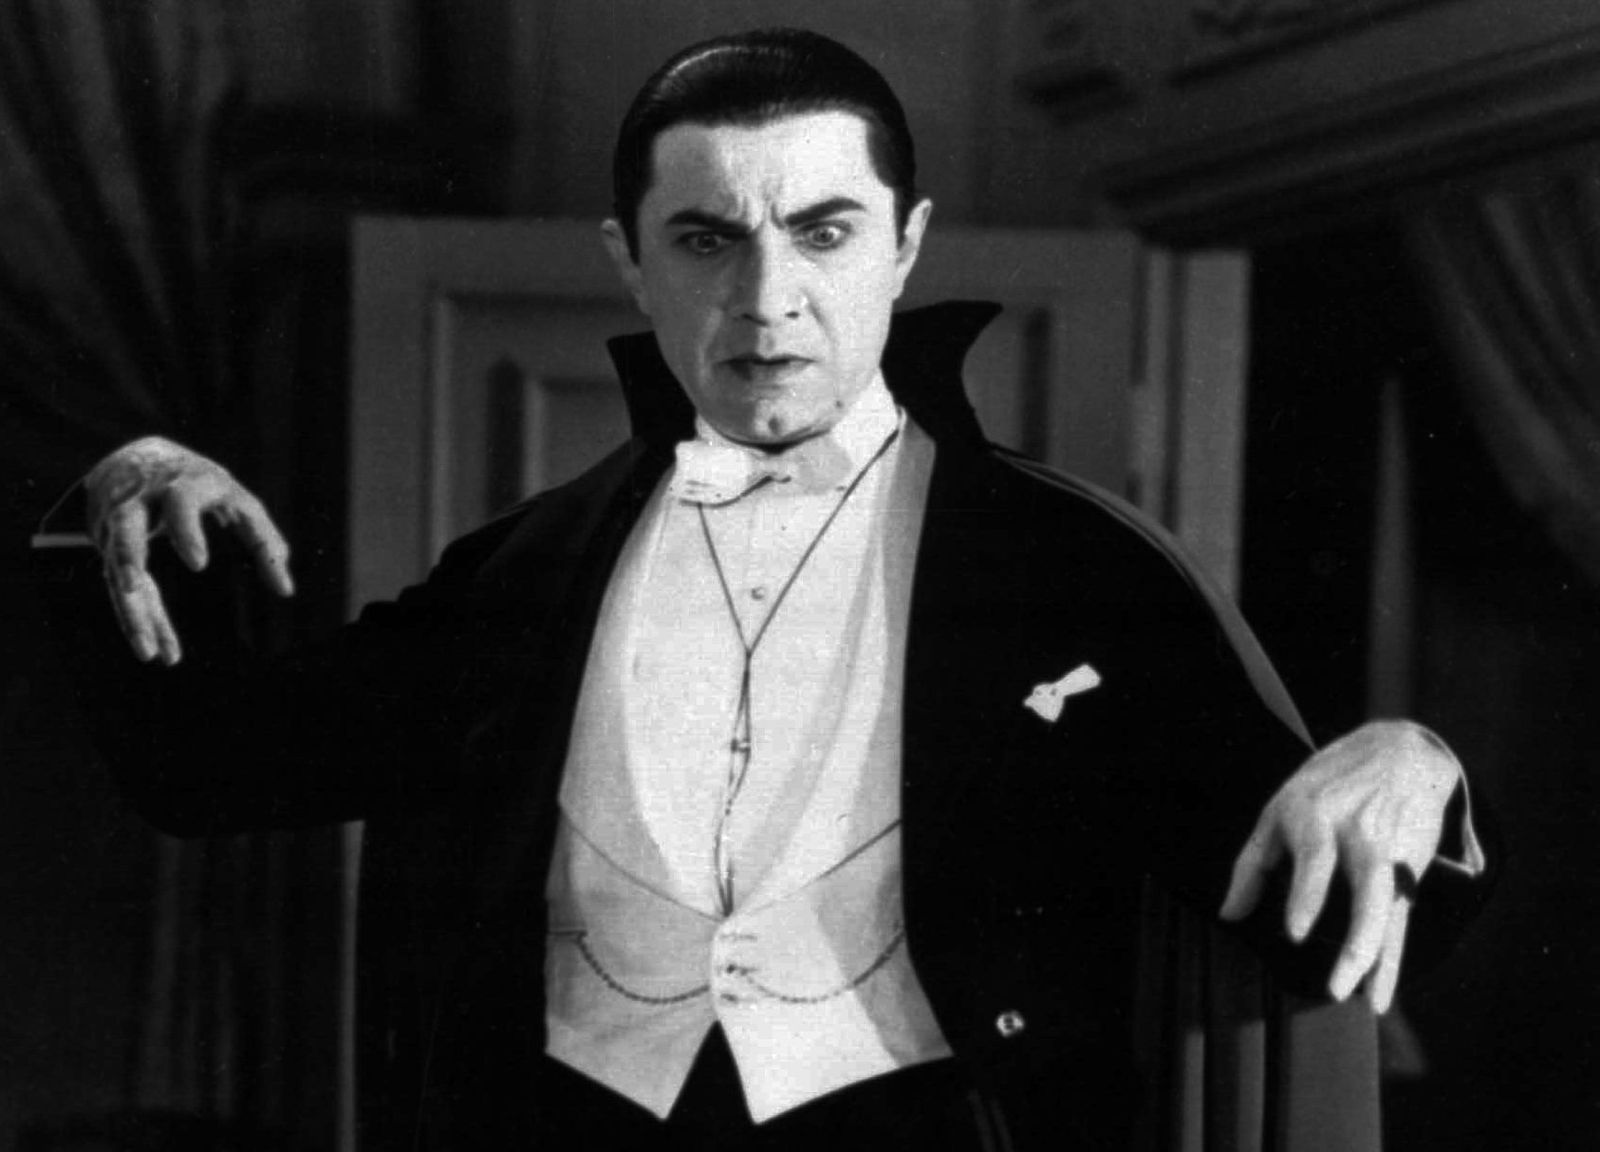 Dracula / Bela Lugosi